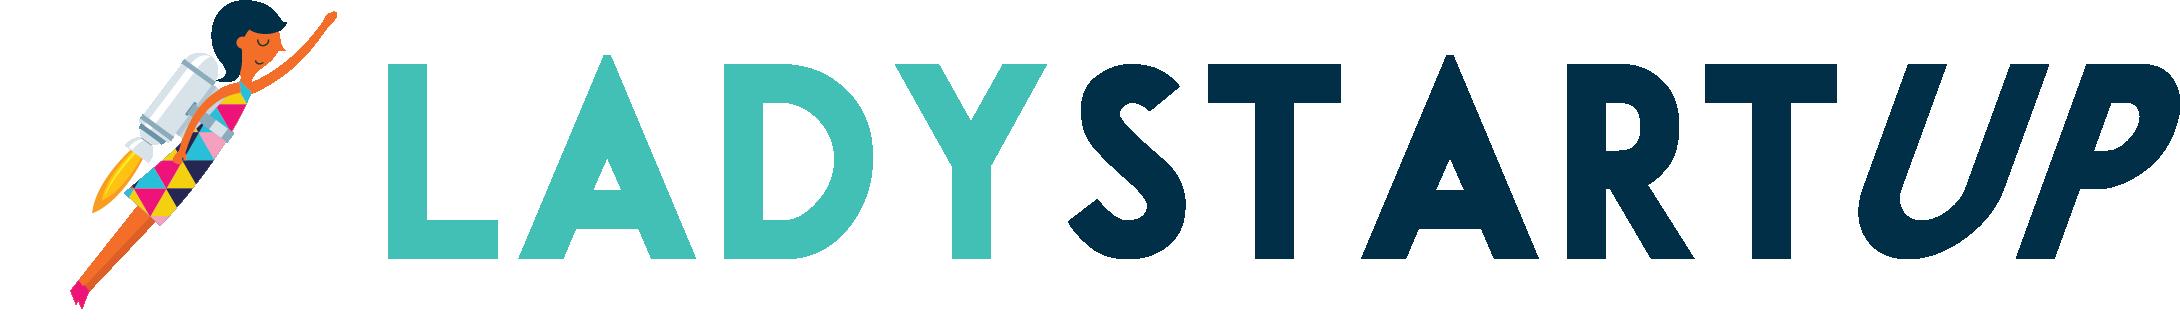 Lady Startup